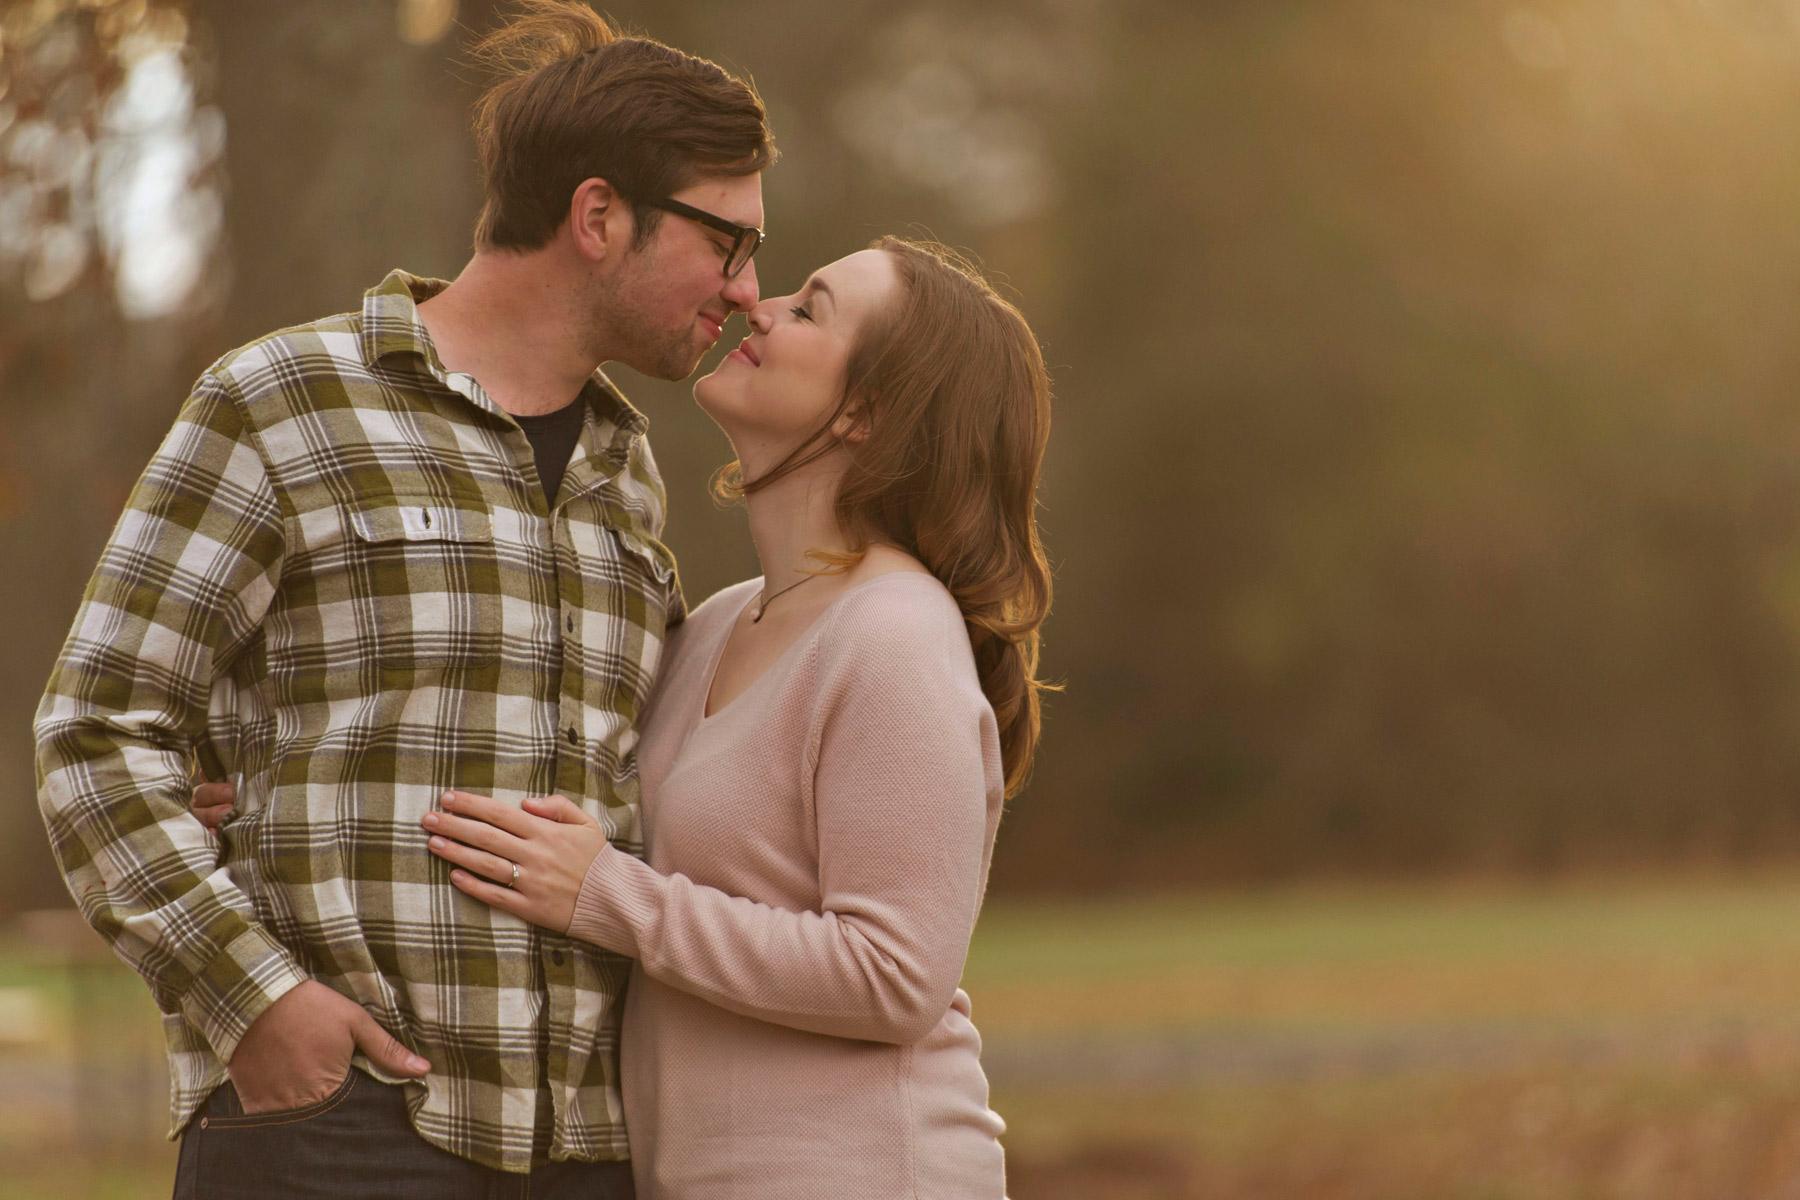 Bucks_county_engagement_session_Tinicum_Park_couple_kisses.JPG